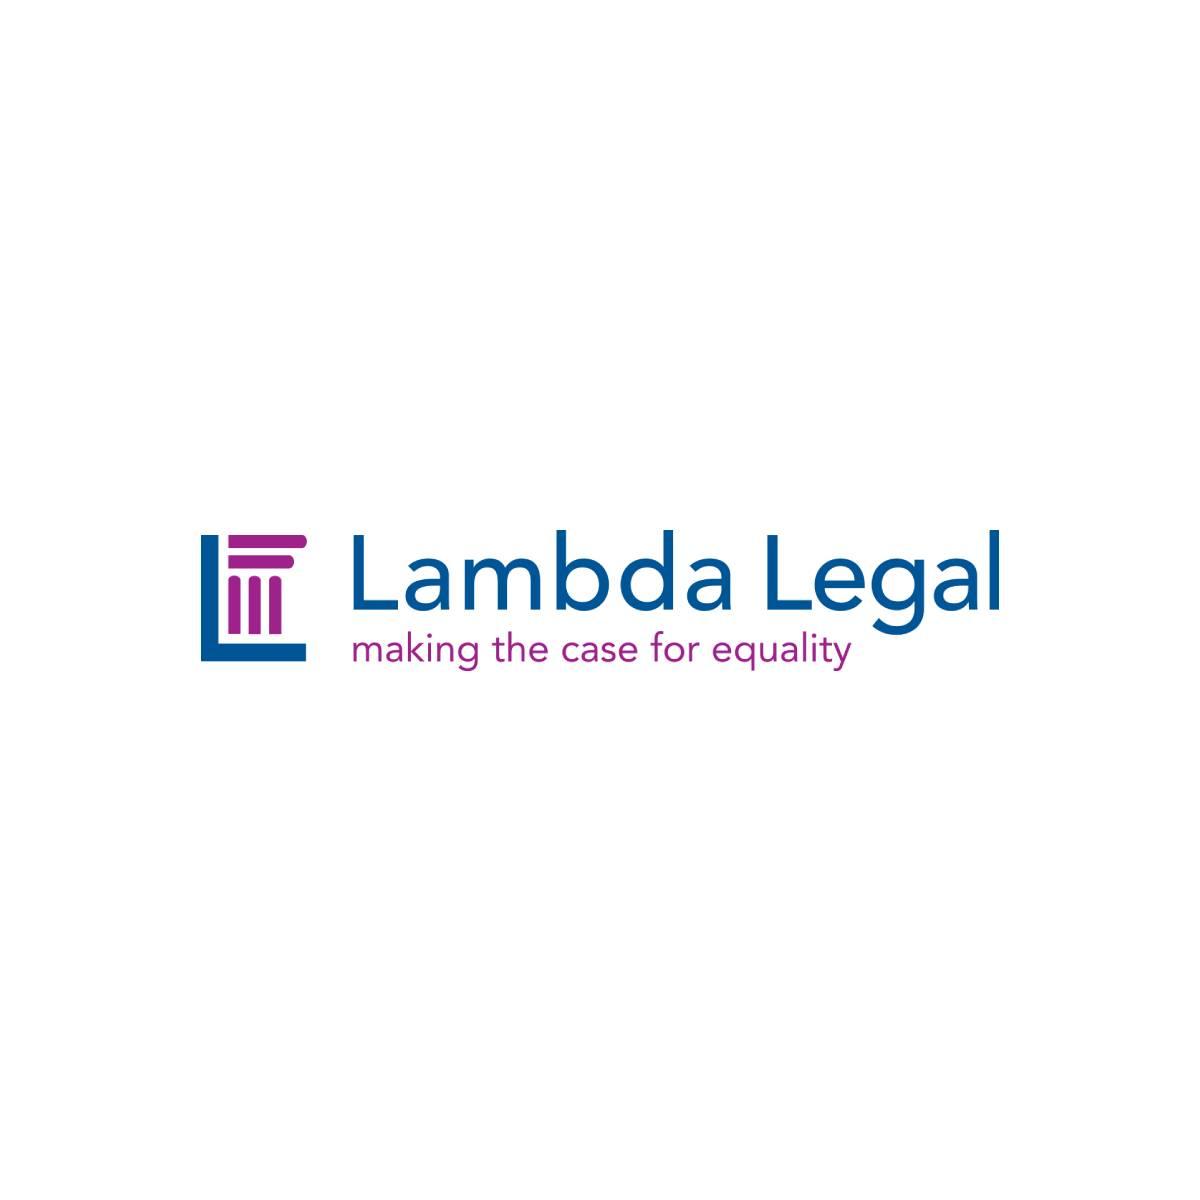 Lambda Legal image